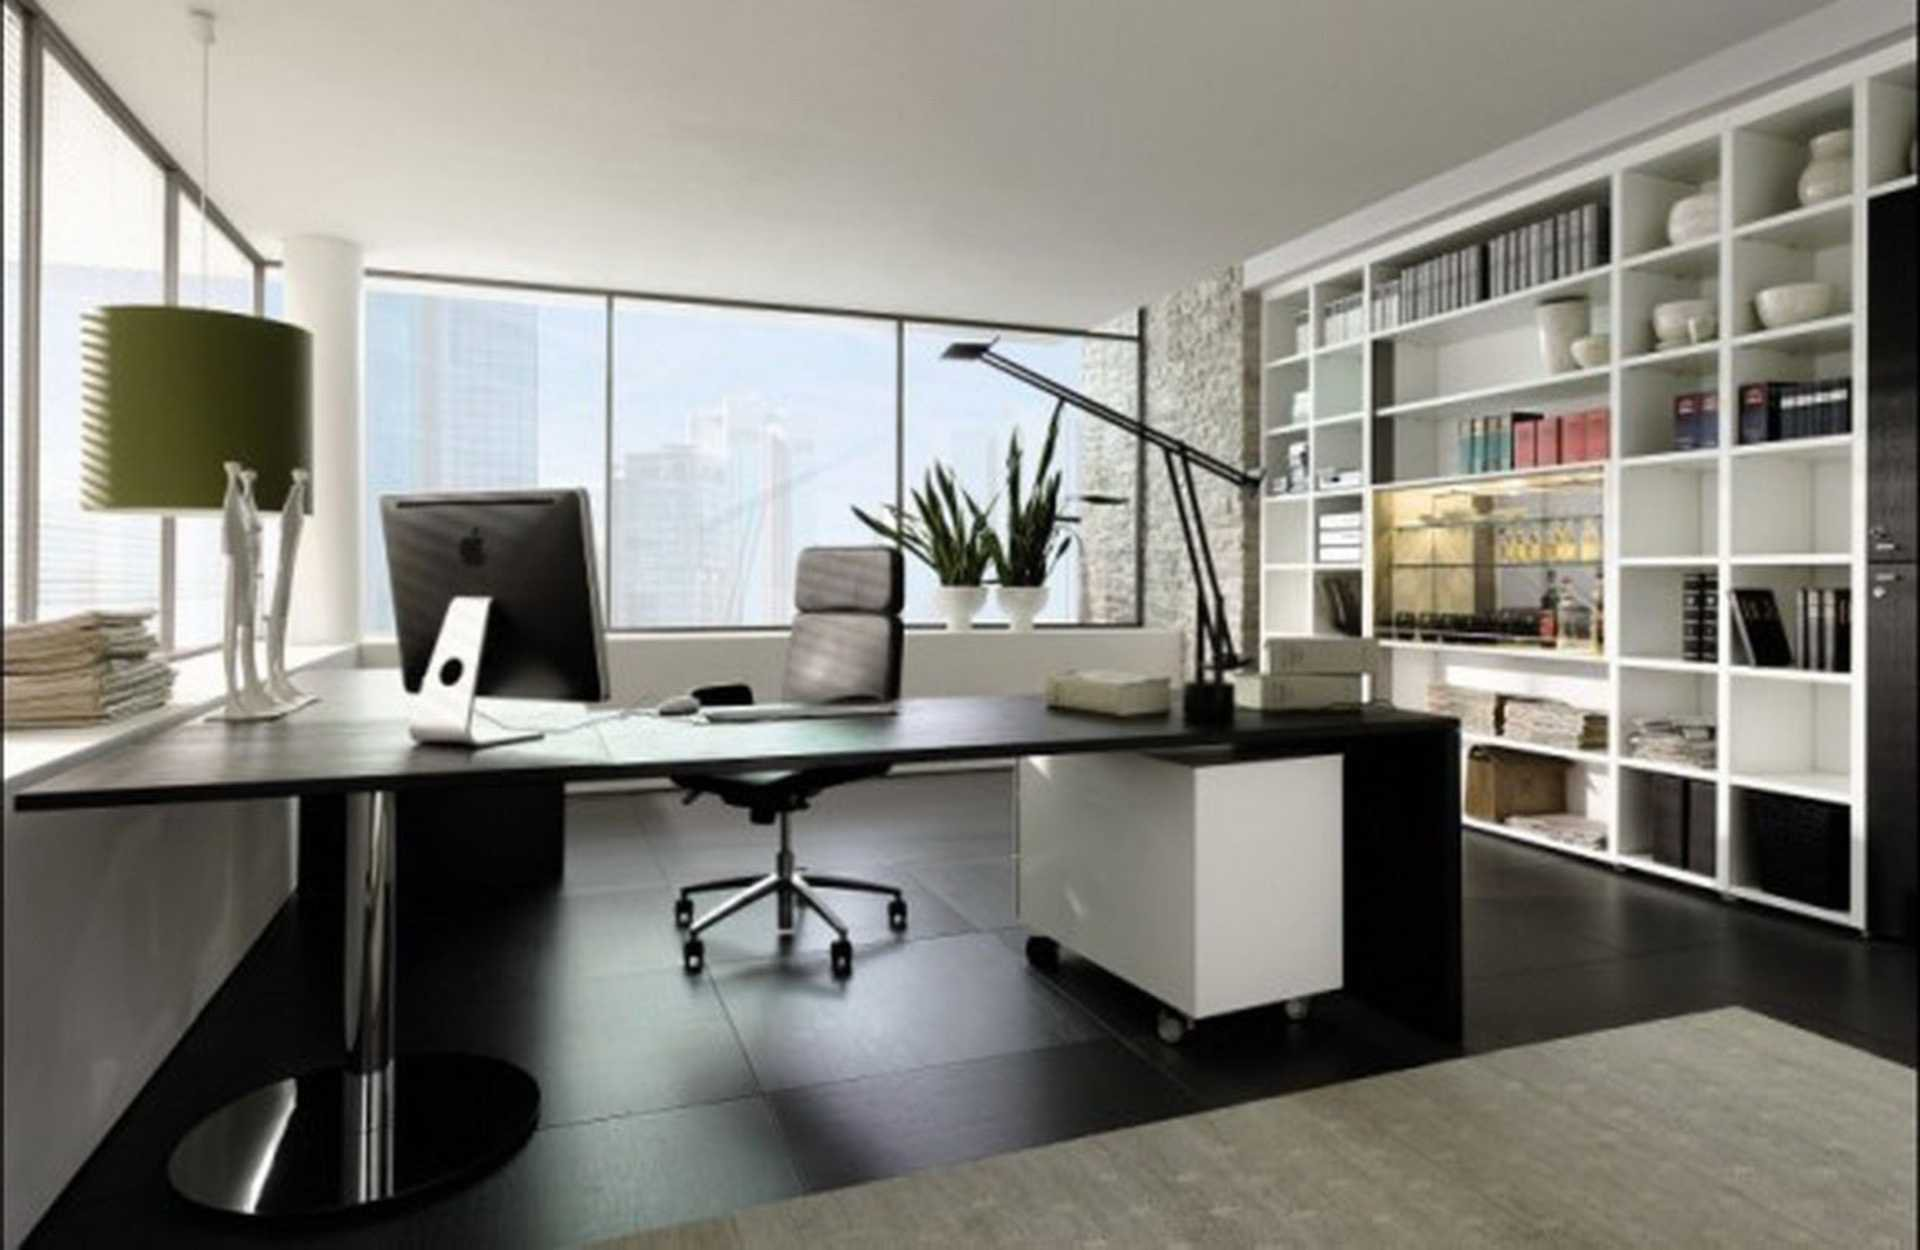 Amazing of Extraordinary Home Office Design Ideas Interio #5141